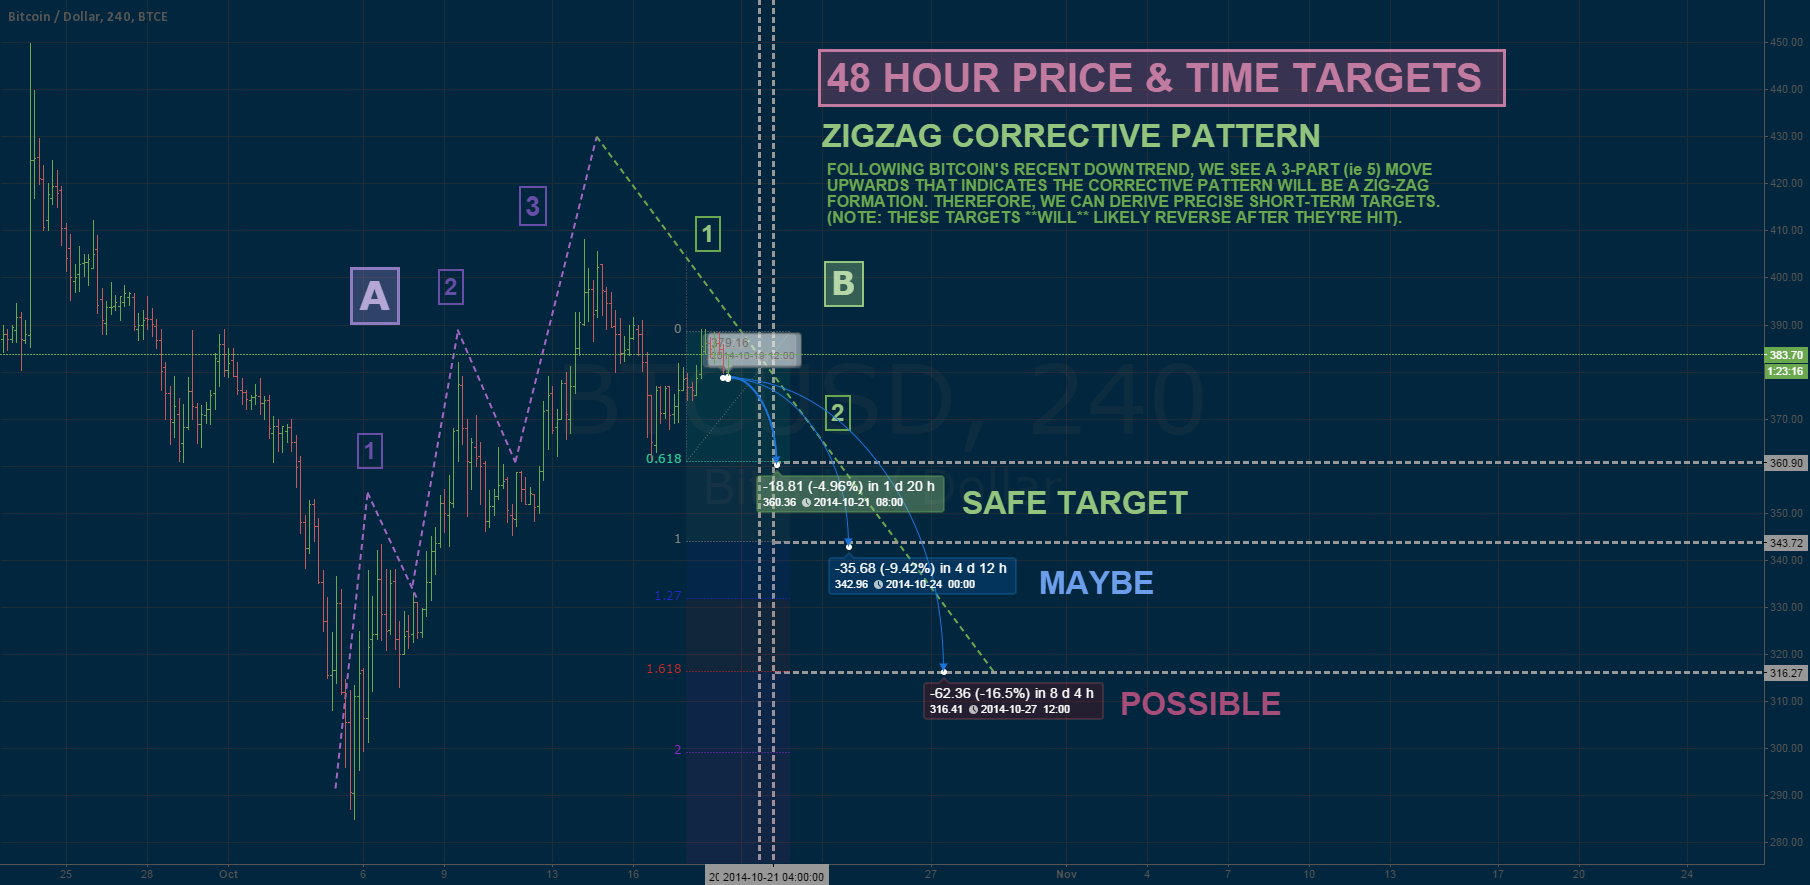 BTC 48HR Price & Time Targets